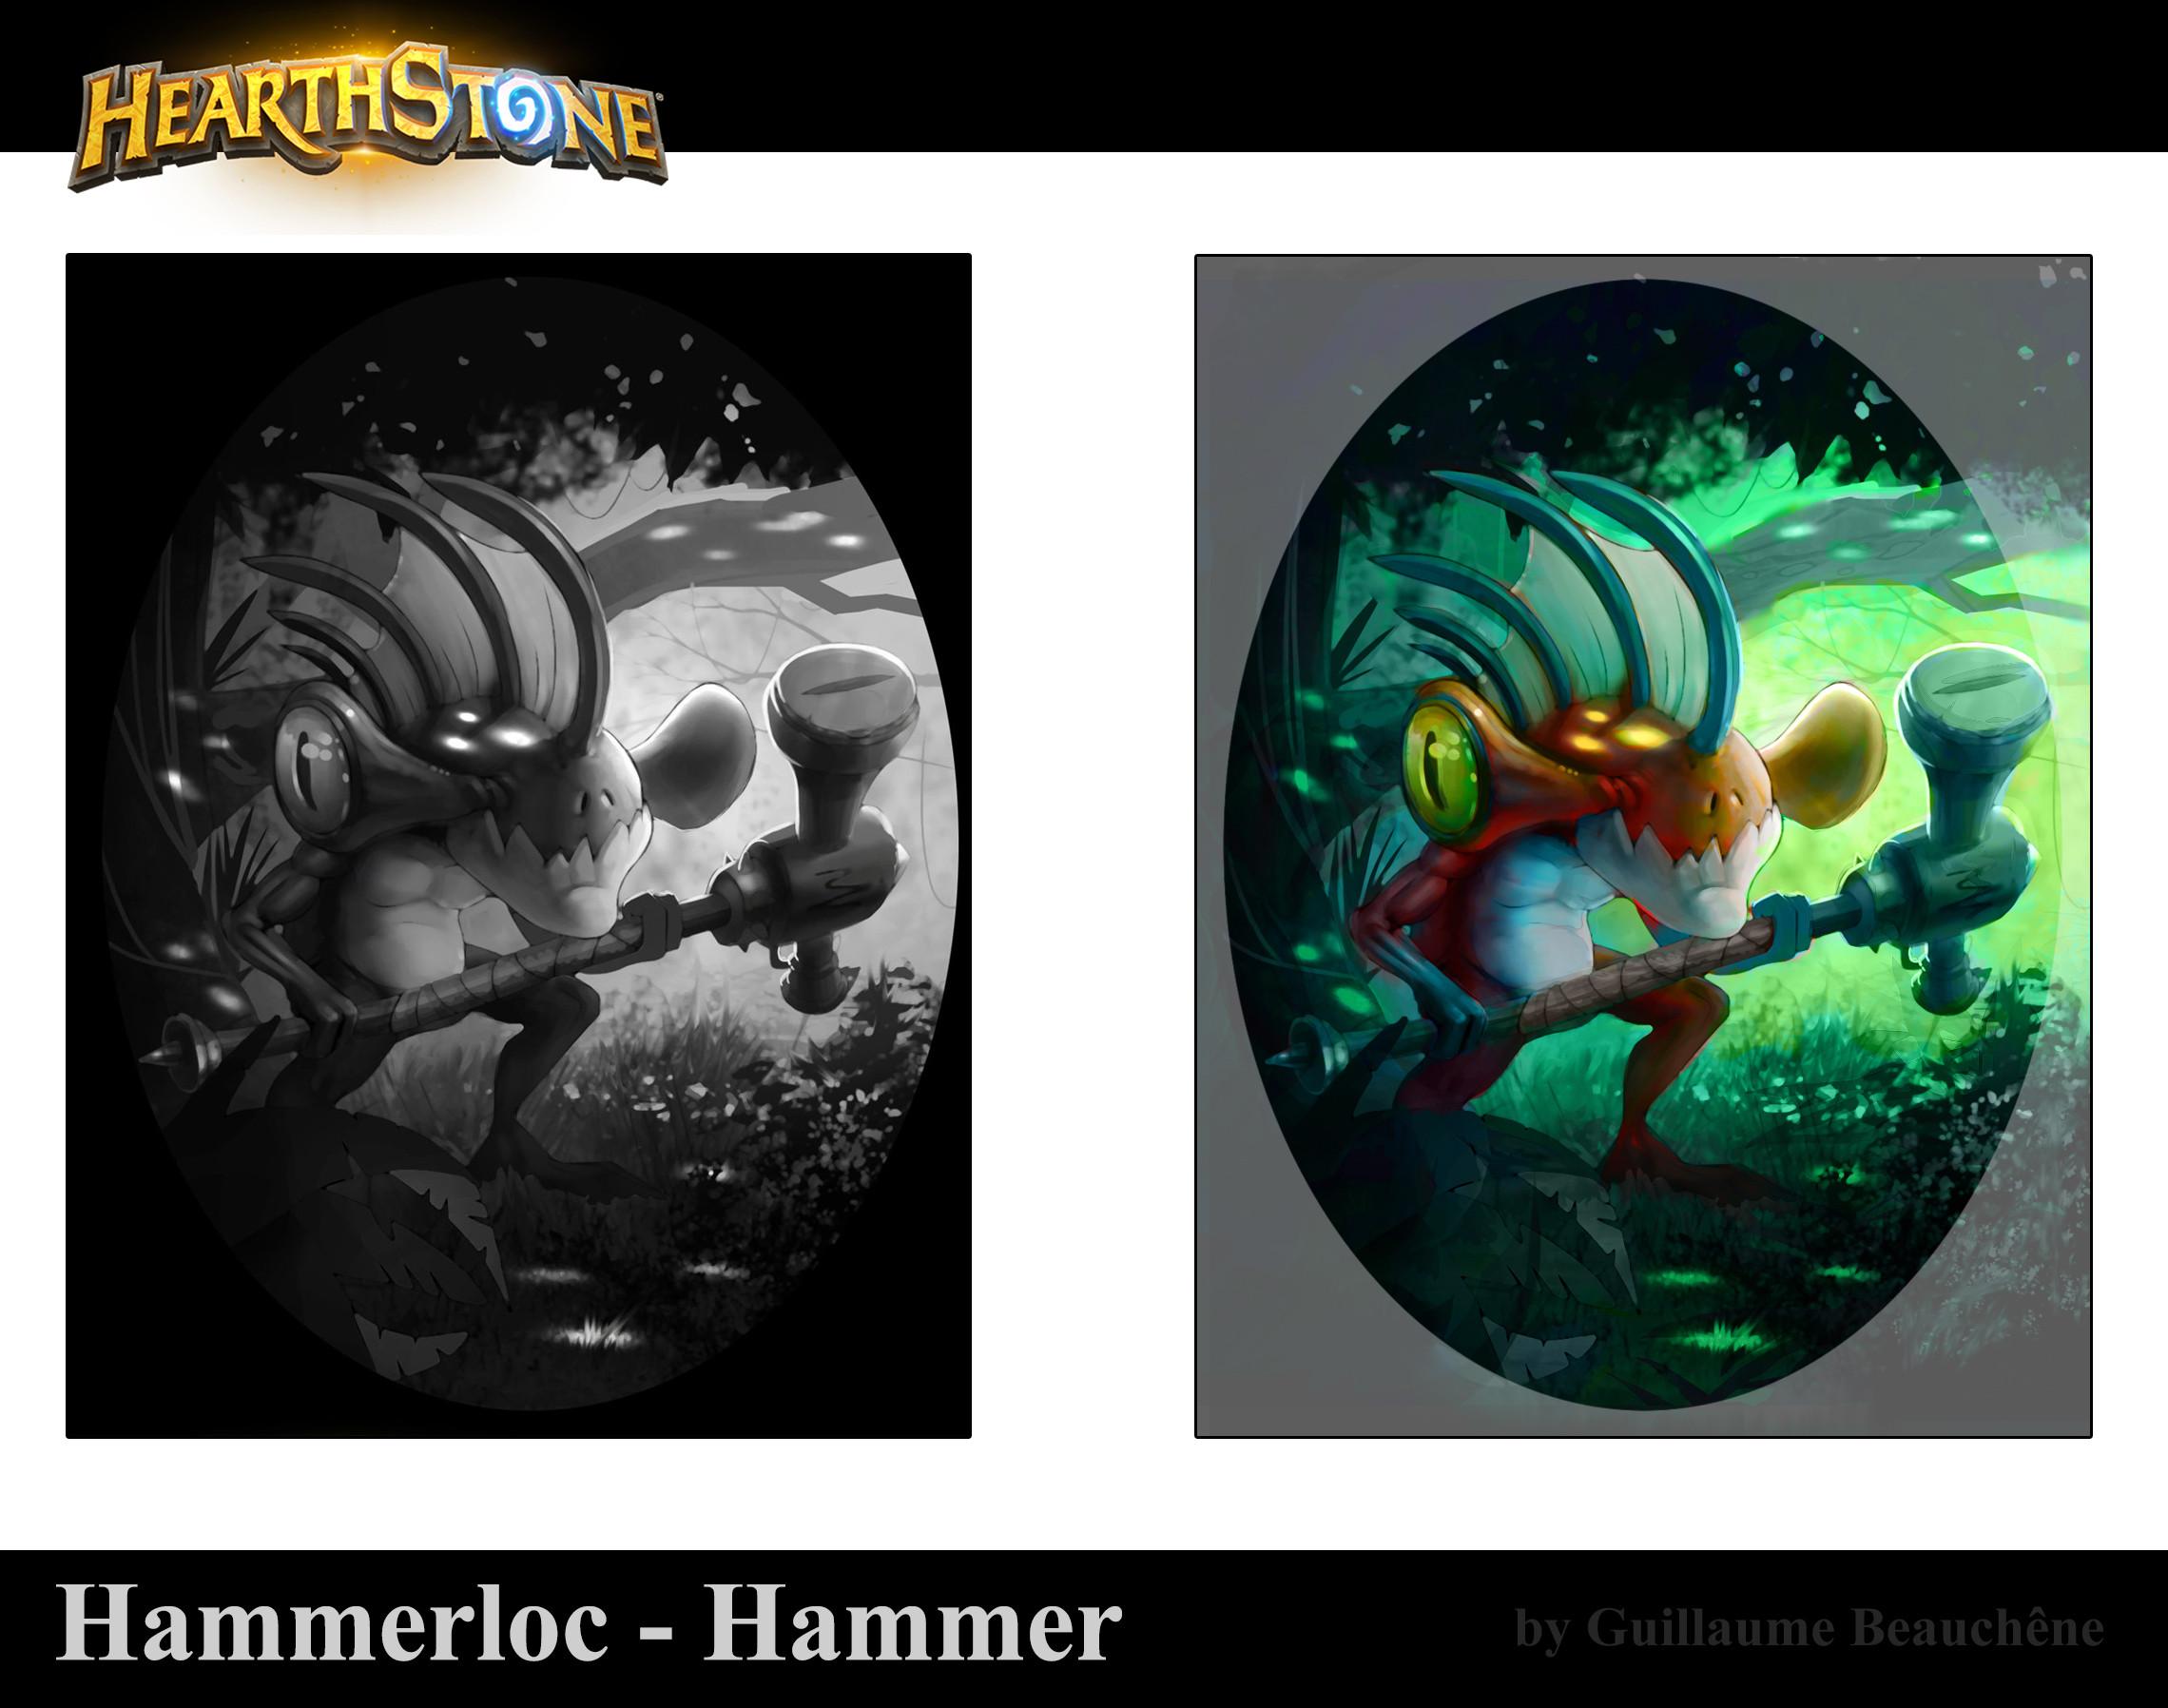 https://youre.outof.cards/media/uploads/12/99/12990c09-b1a1-426d-8873-c4ba27ccb8ce/guillaume-beauchene-6-hammerloc-color-final.jpg